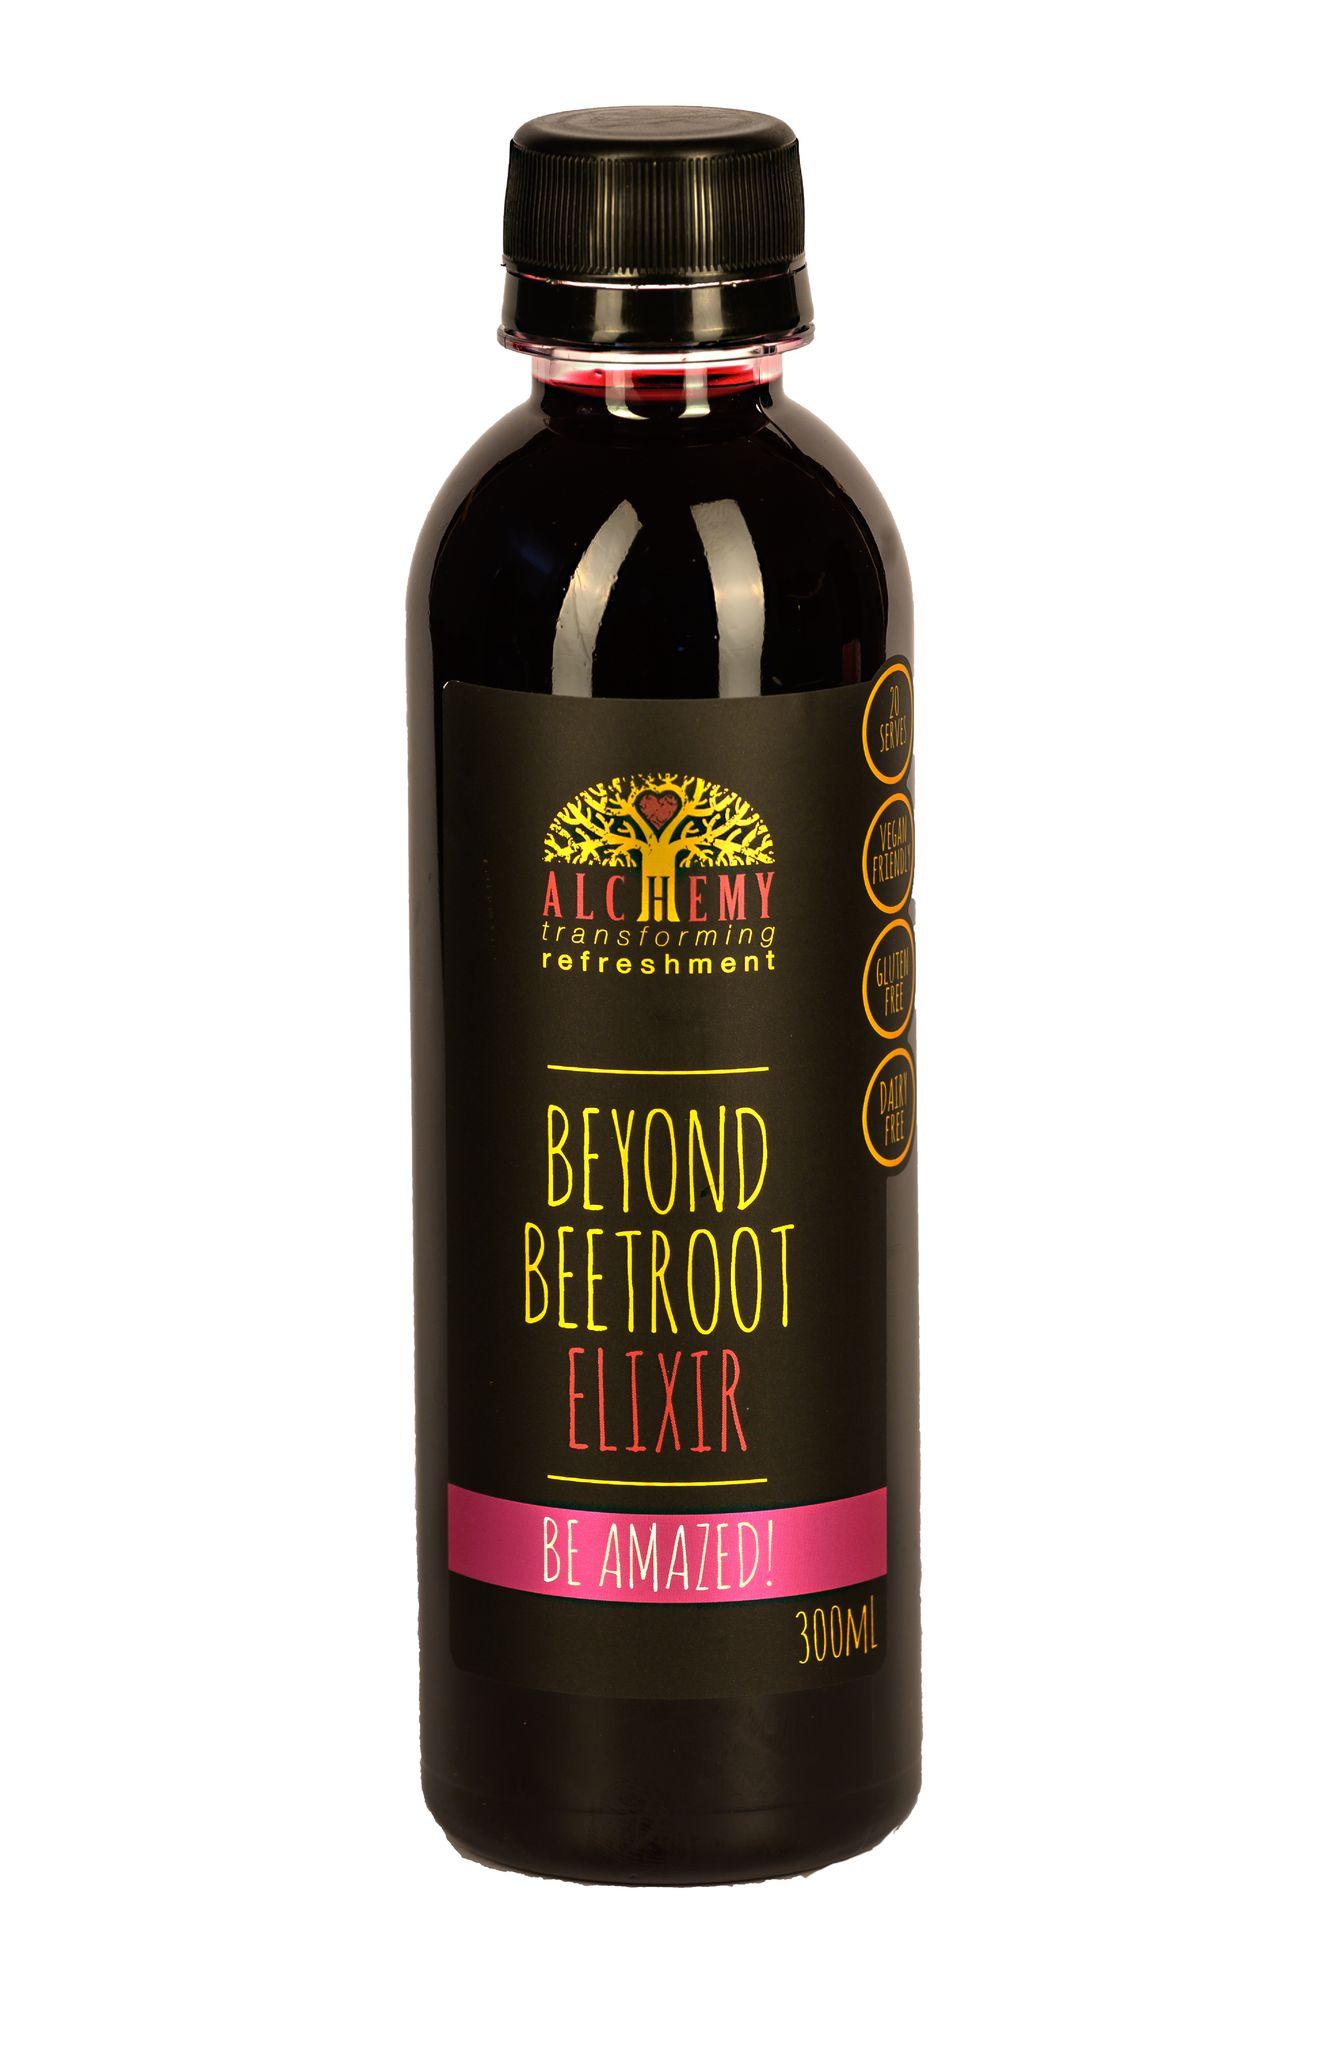 Alchemy Beyond Beetroot 750ml bottles